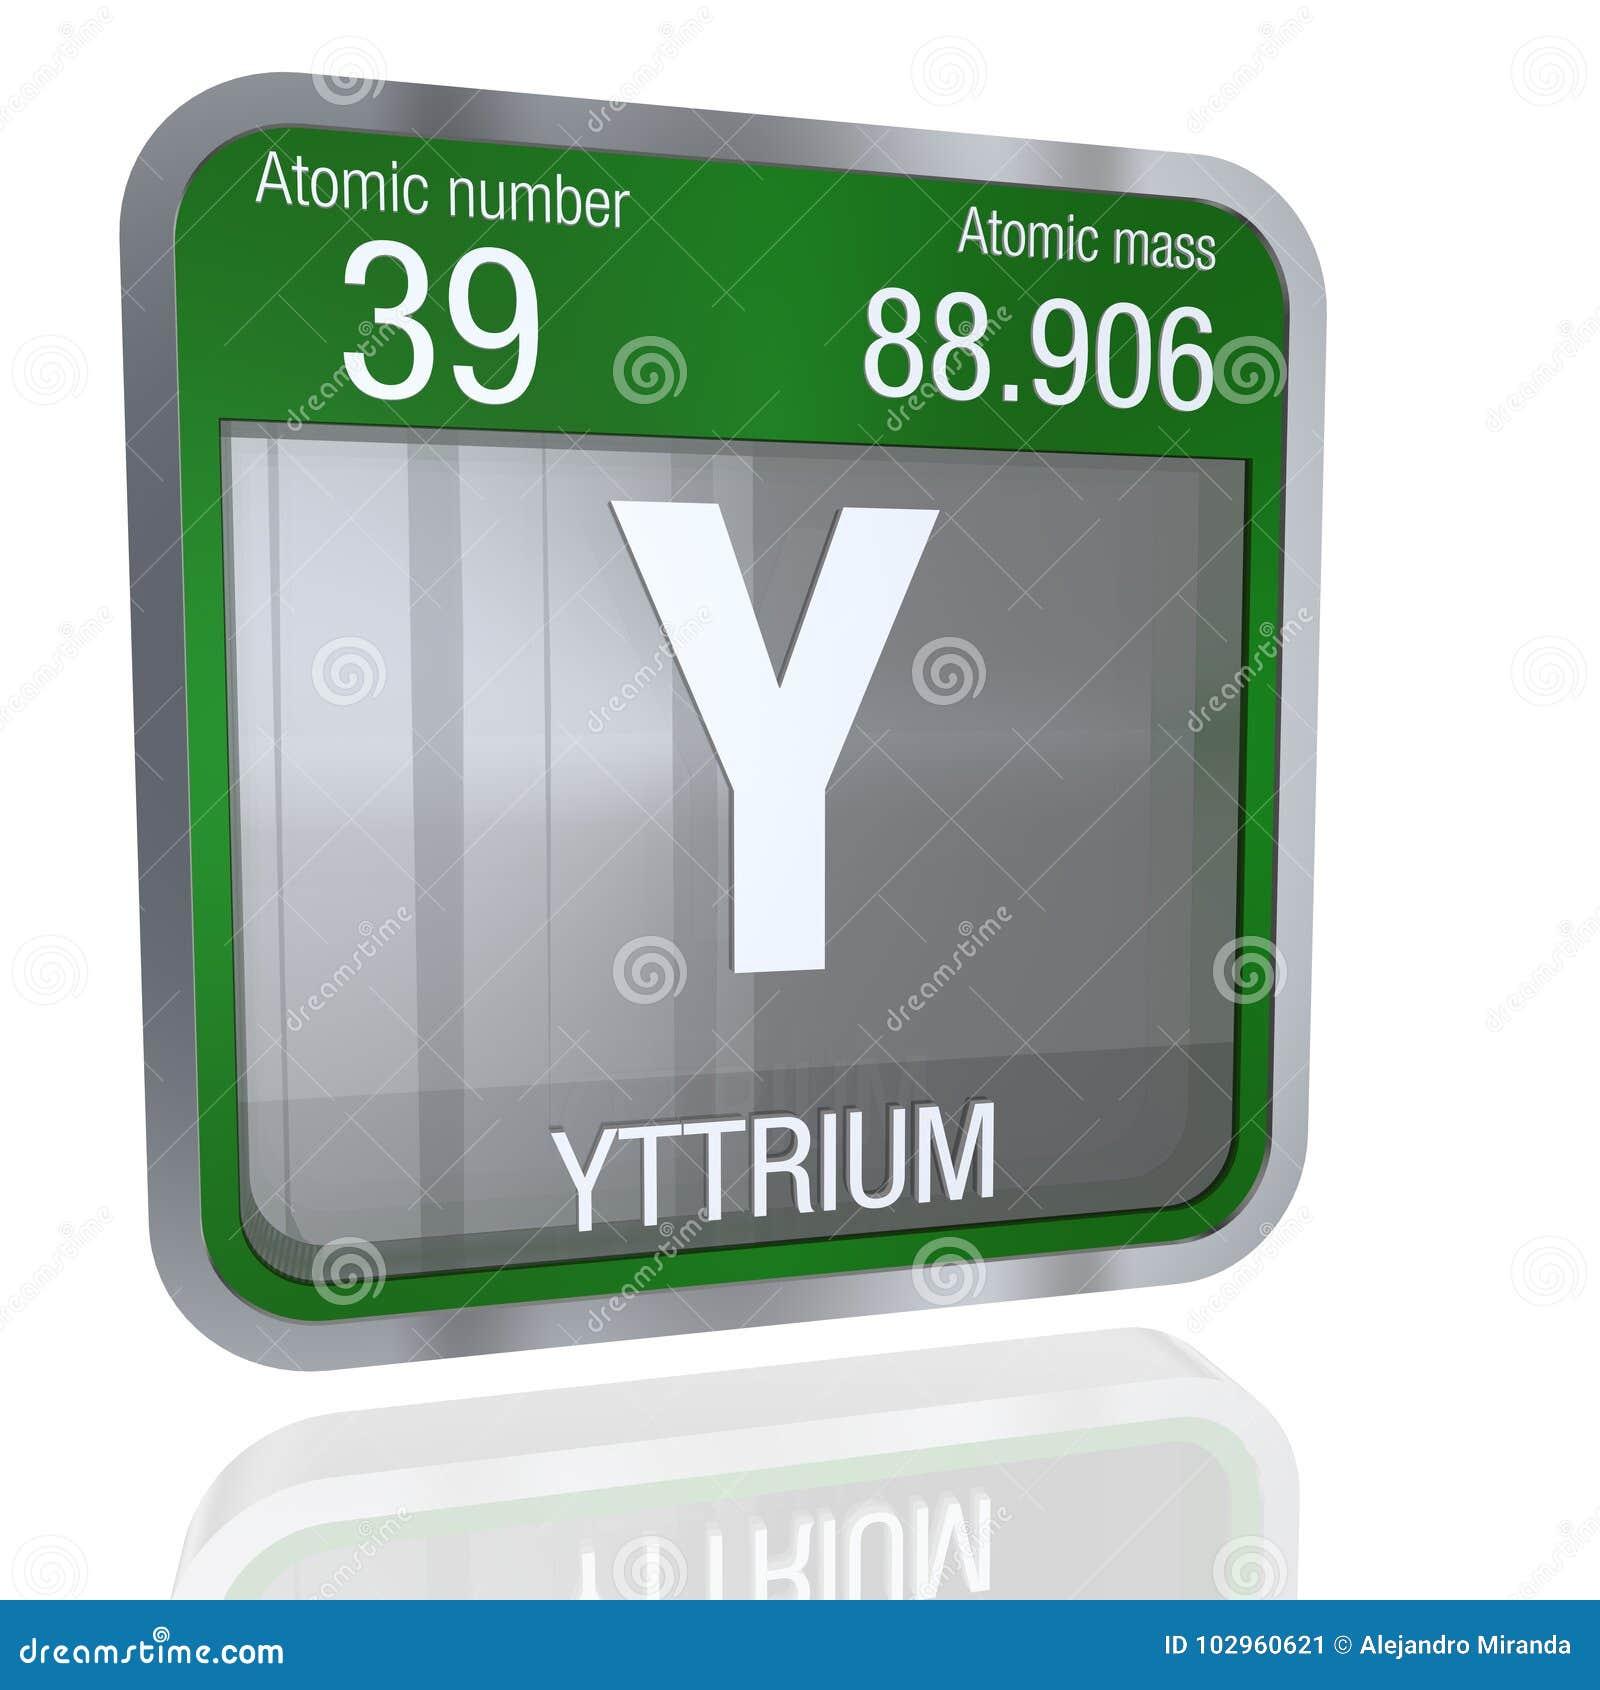 Yttrium Symbol In Square Shape With Metallic Border And Transparent